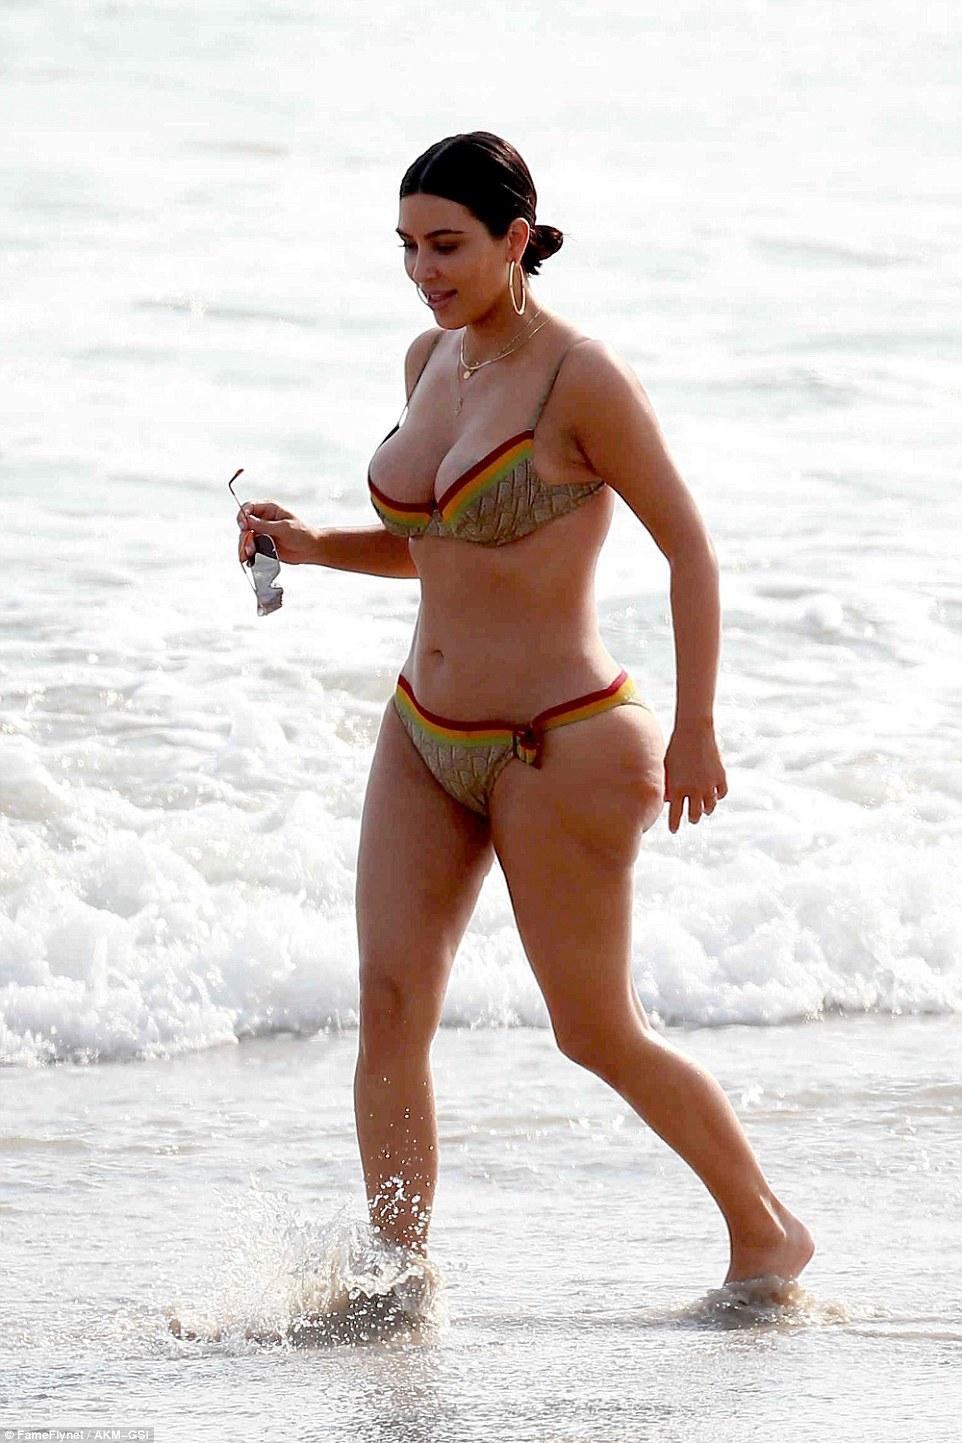 Kim Kardashian spills out curves in skimpy bikini in Mexico